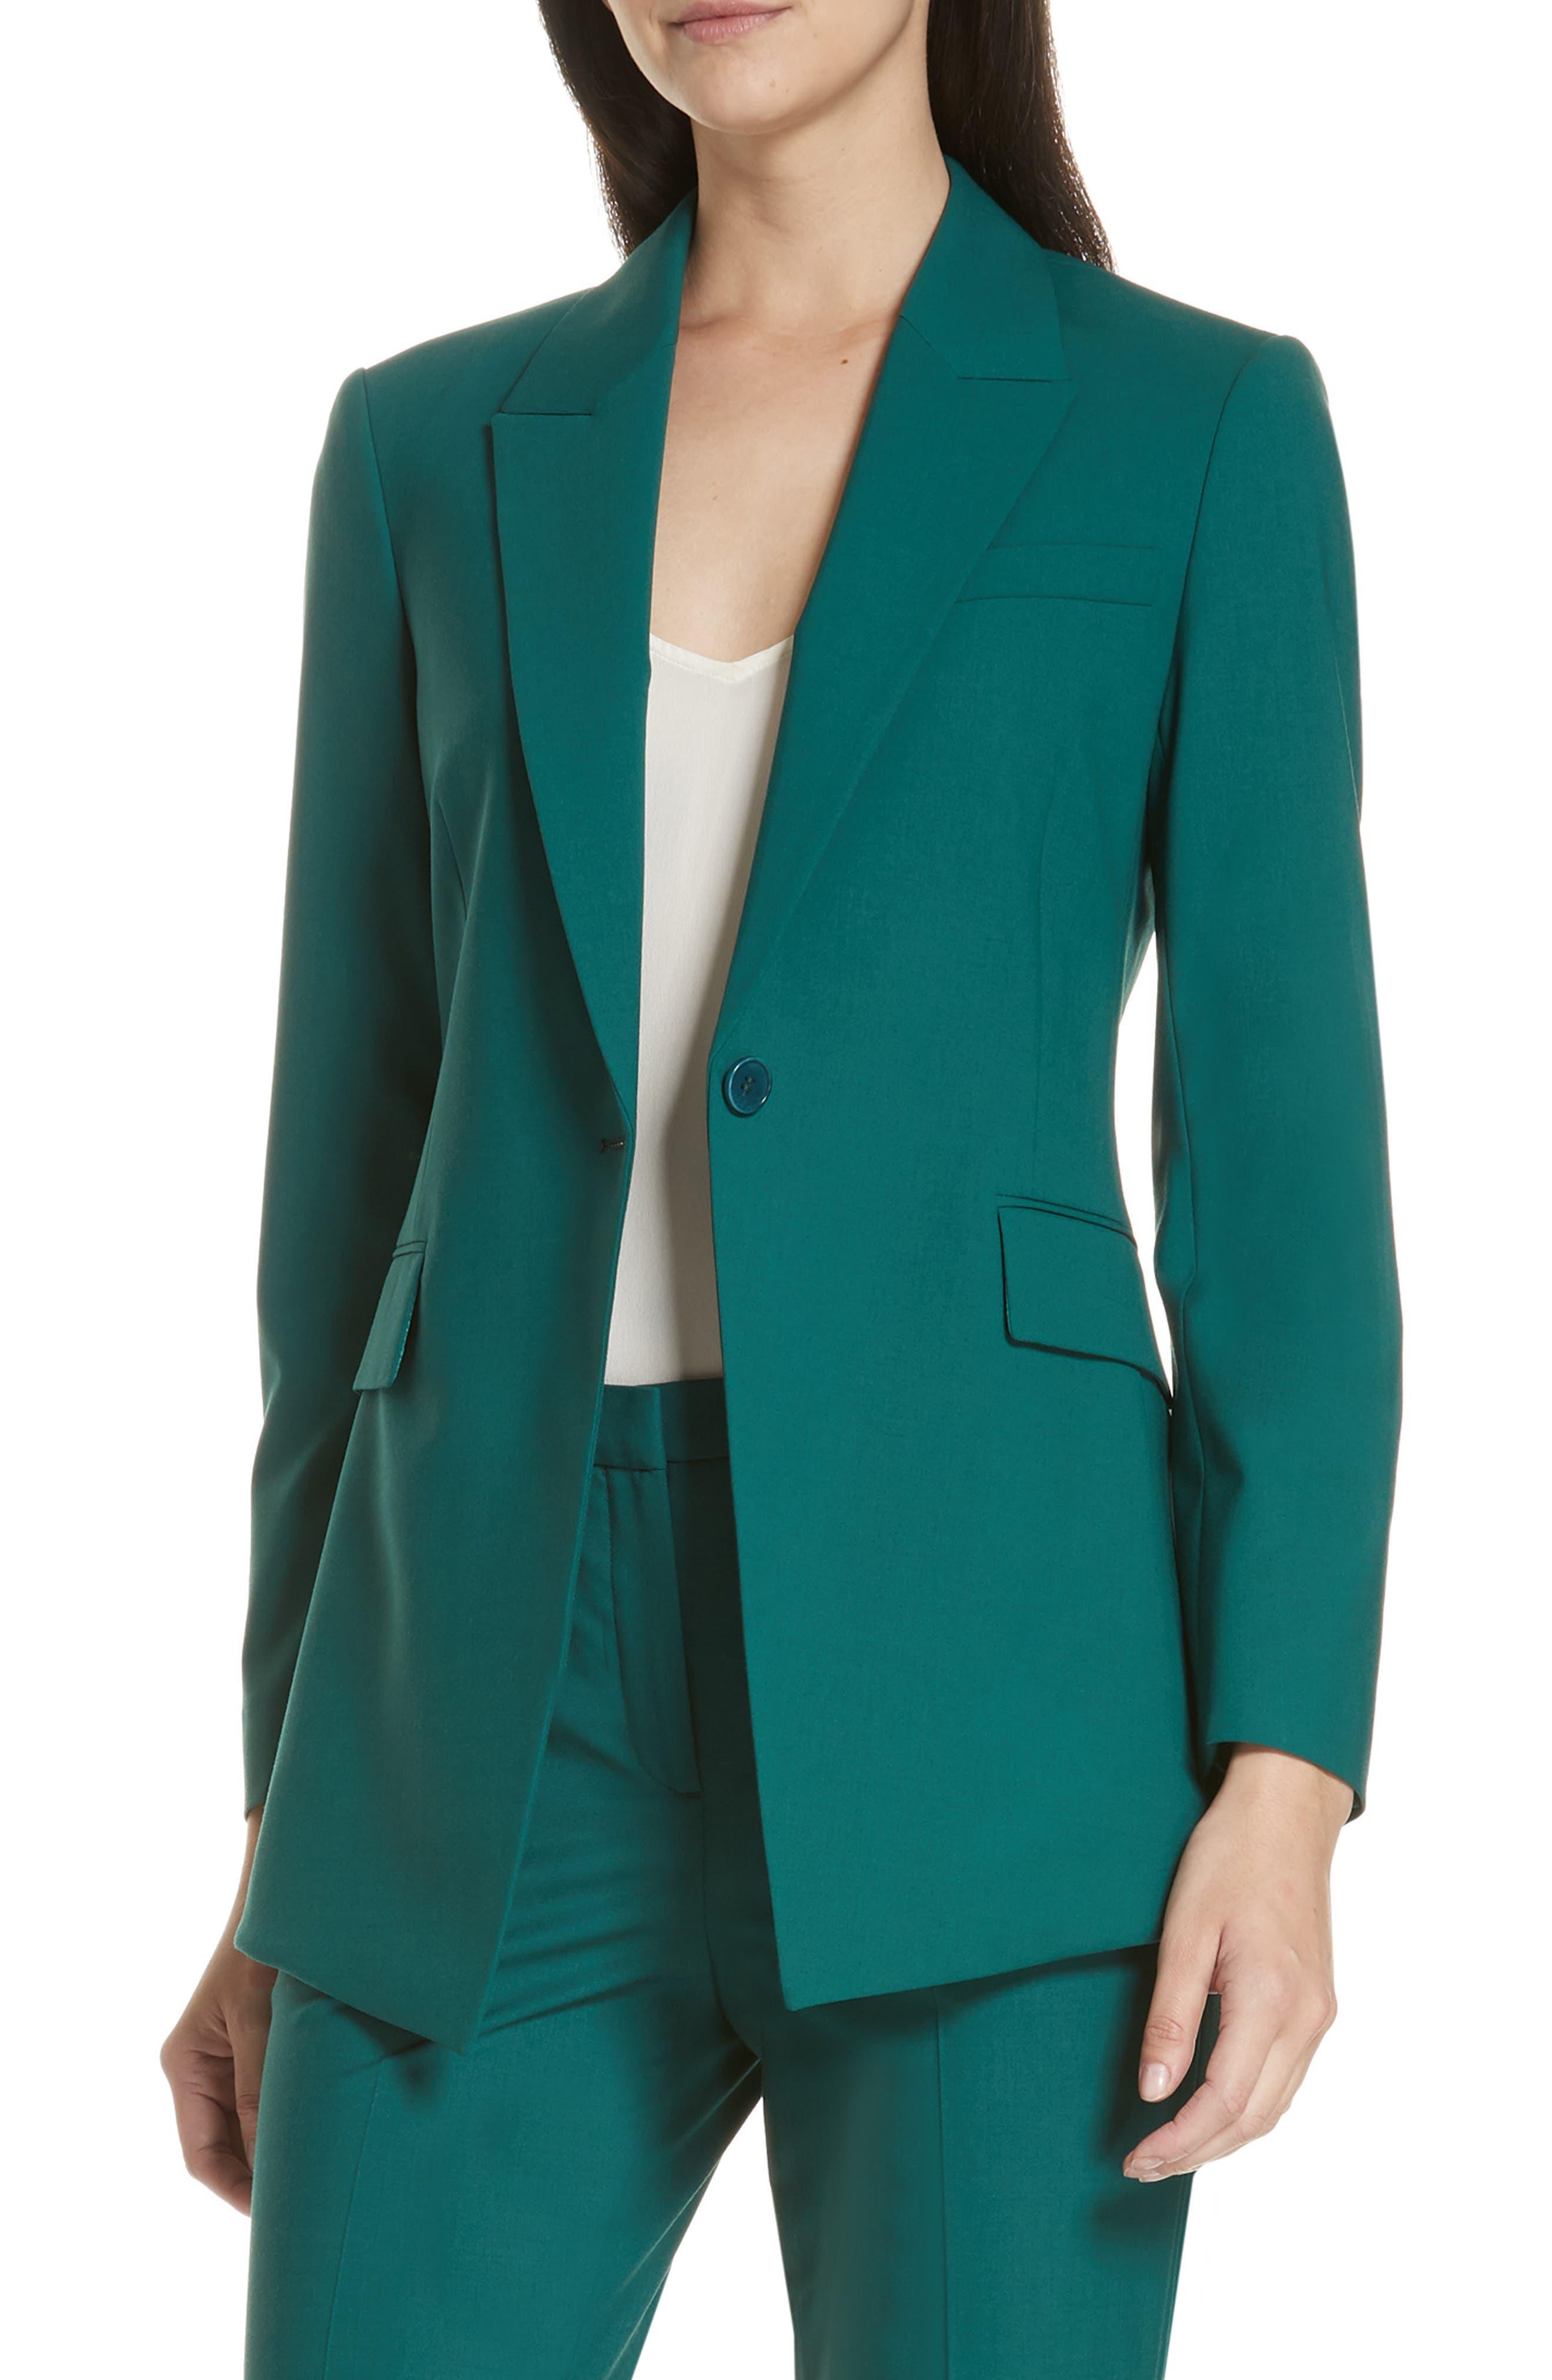 Etienette B Good Wool Suit Jacket,                         Main,                         color, BRIGHT POPLAR